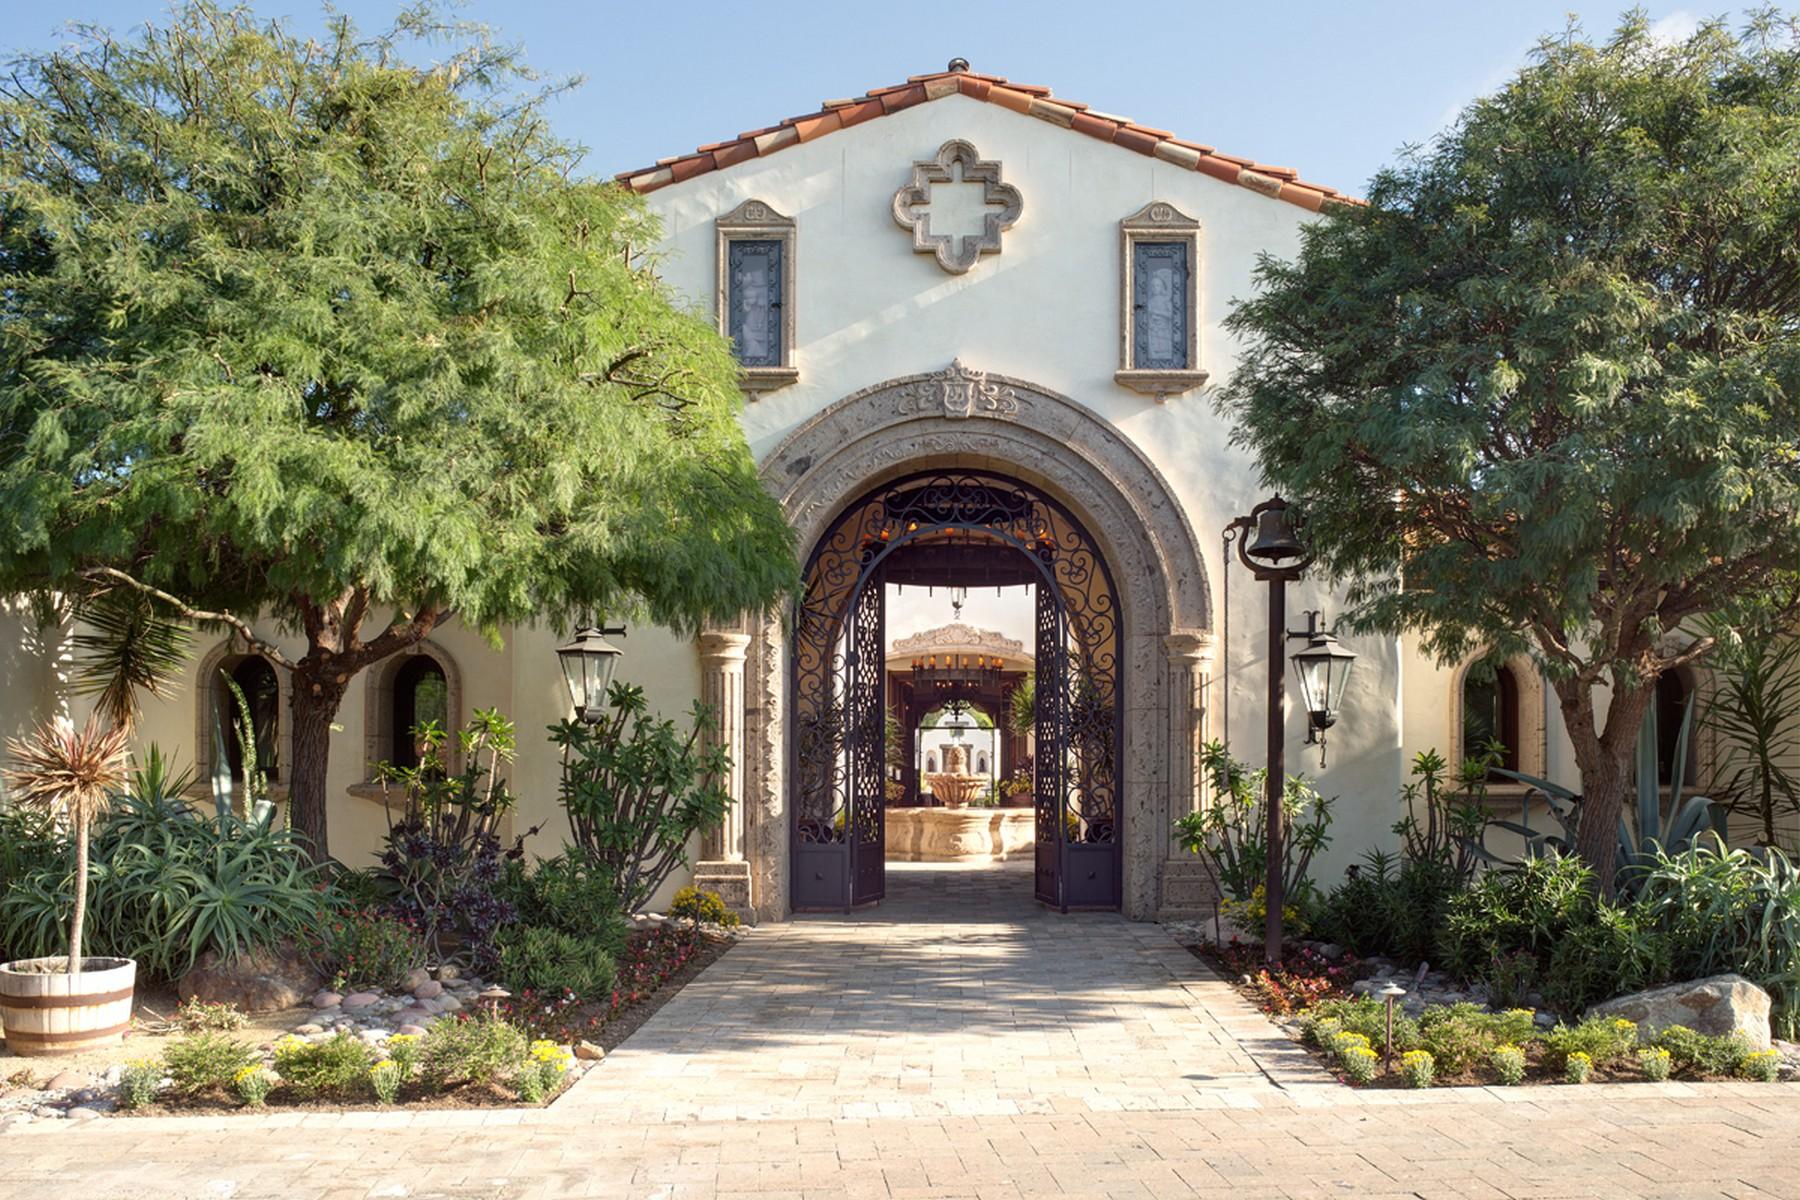 Kiểu Hacienda / Kiểu Estancia / Đồn điền vì Bán tại 6900 Via Del Charro Rancho Santa Fe, California, 92067 Hoa Kỳ